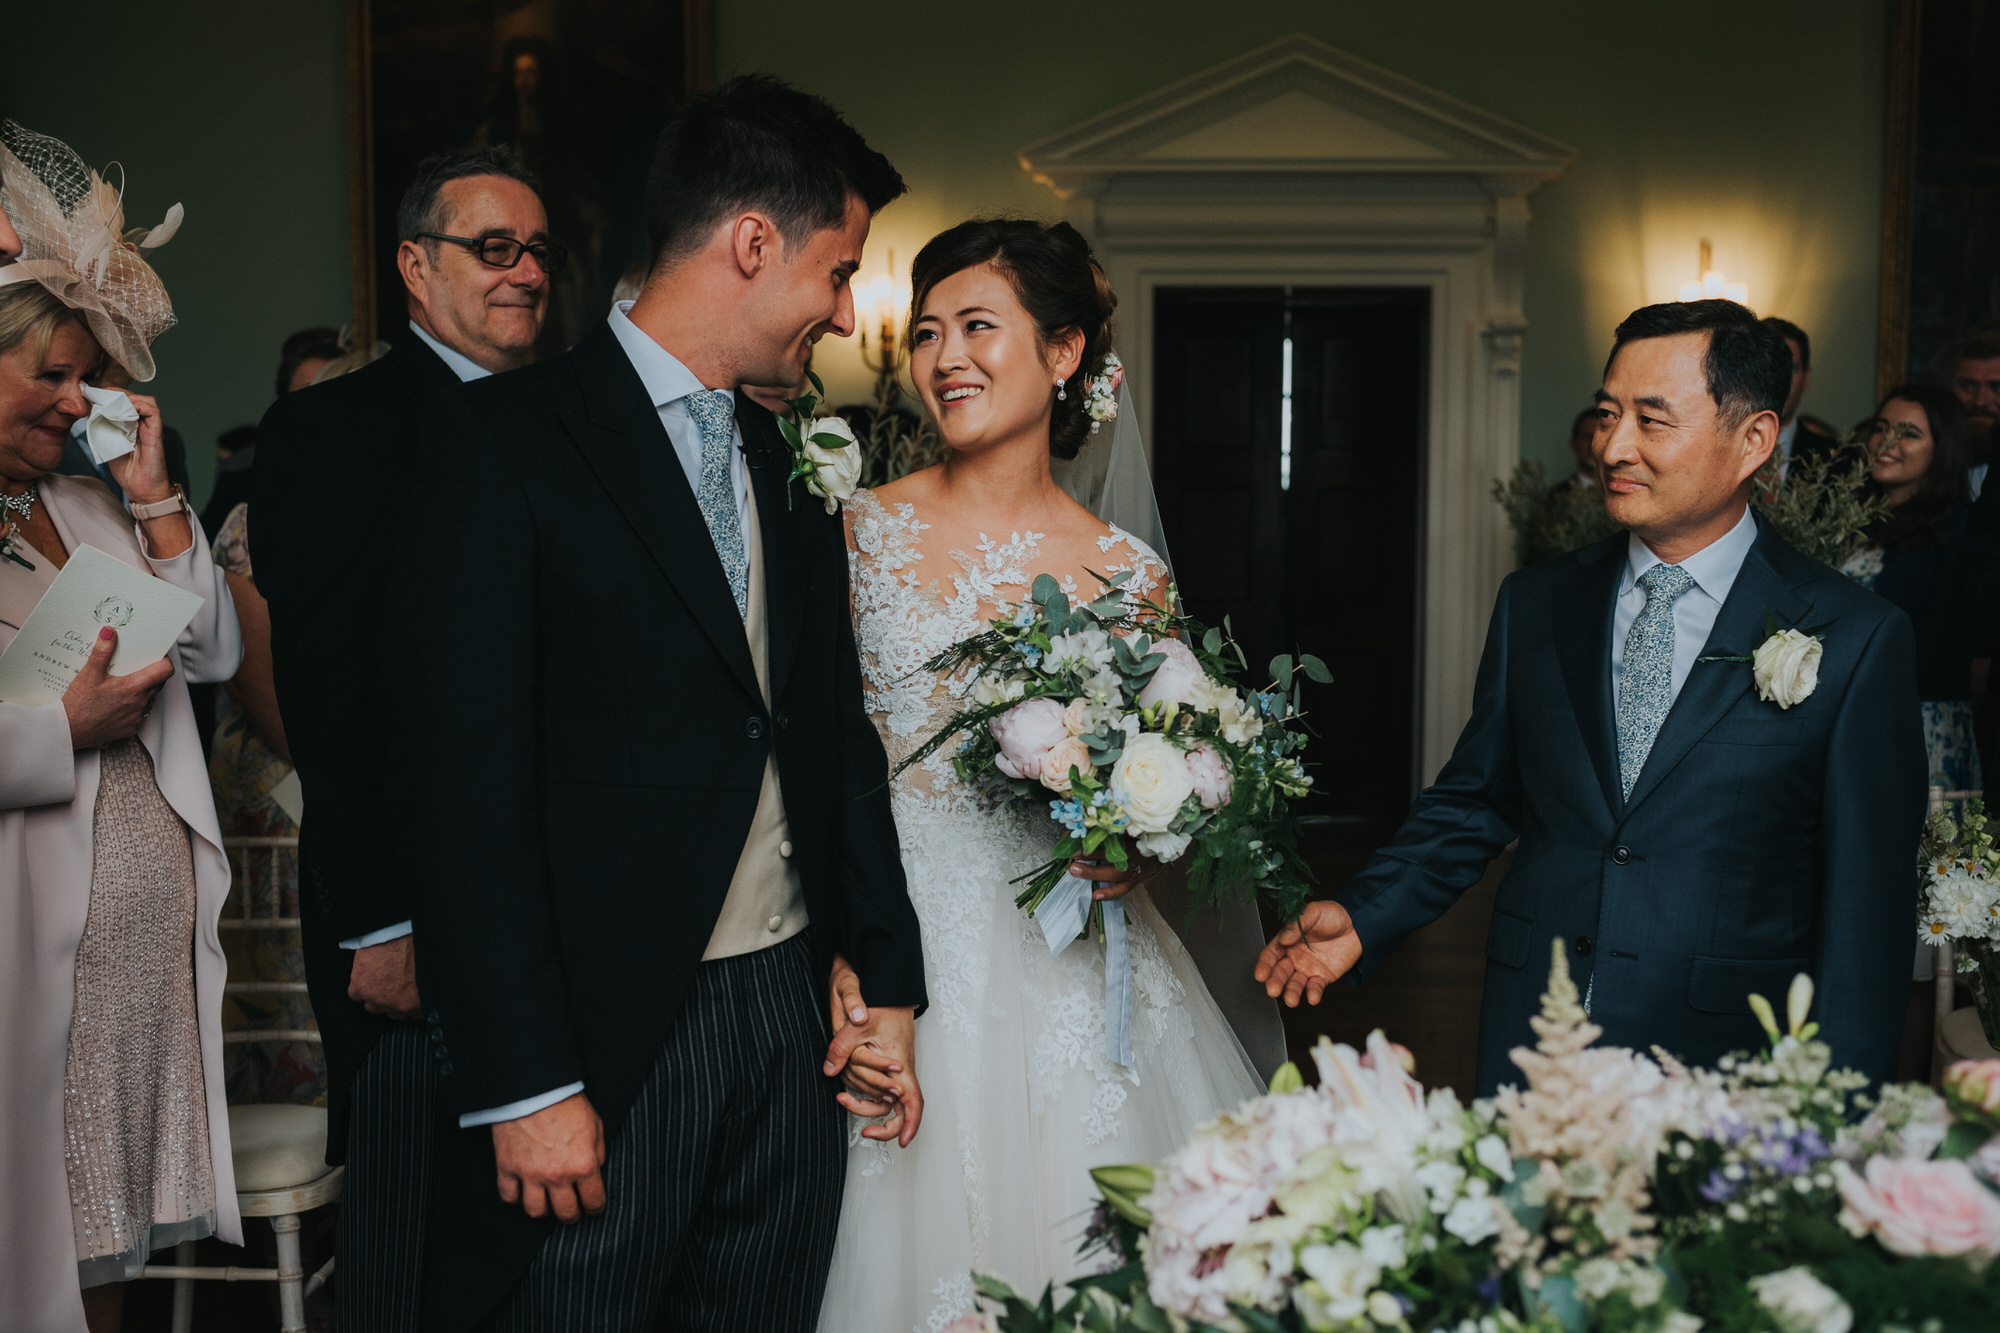 Kirtlington park wedding ceremony